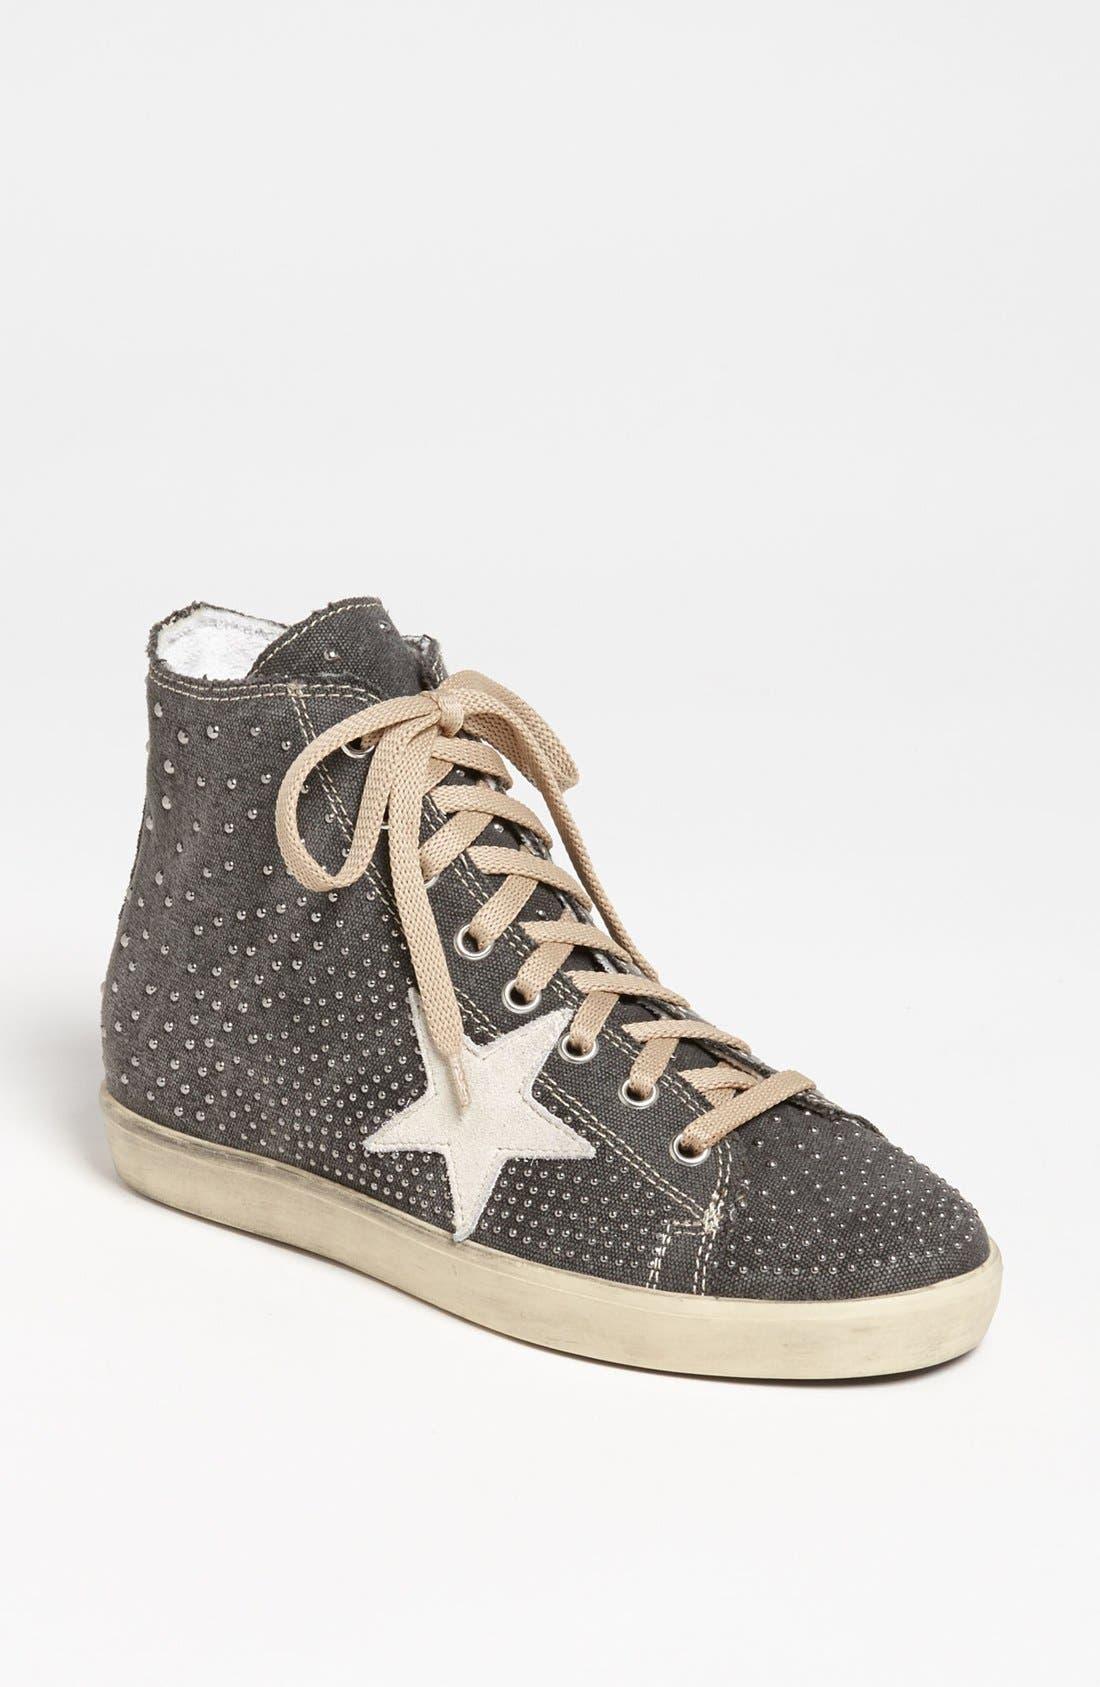 Main Image - Nana Studded Sneaker